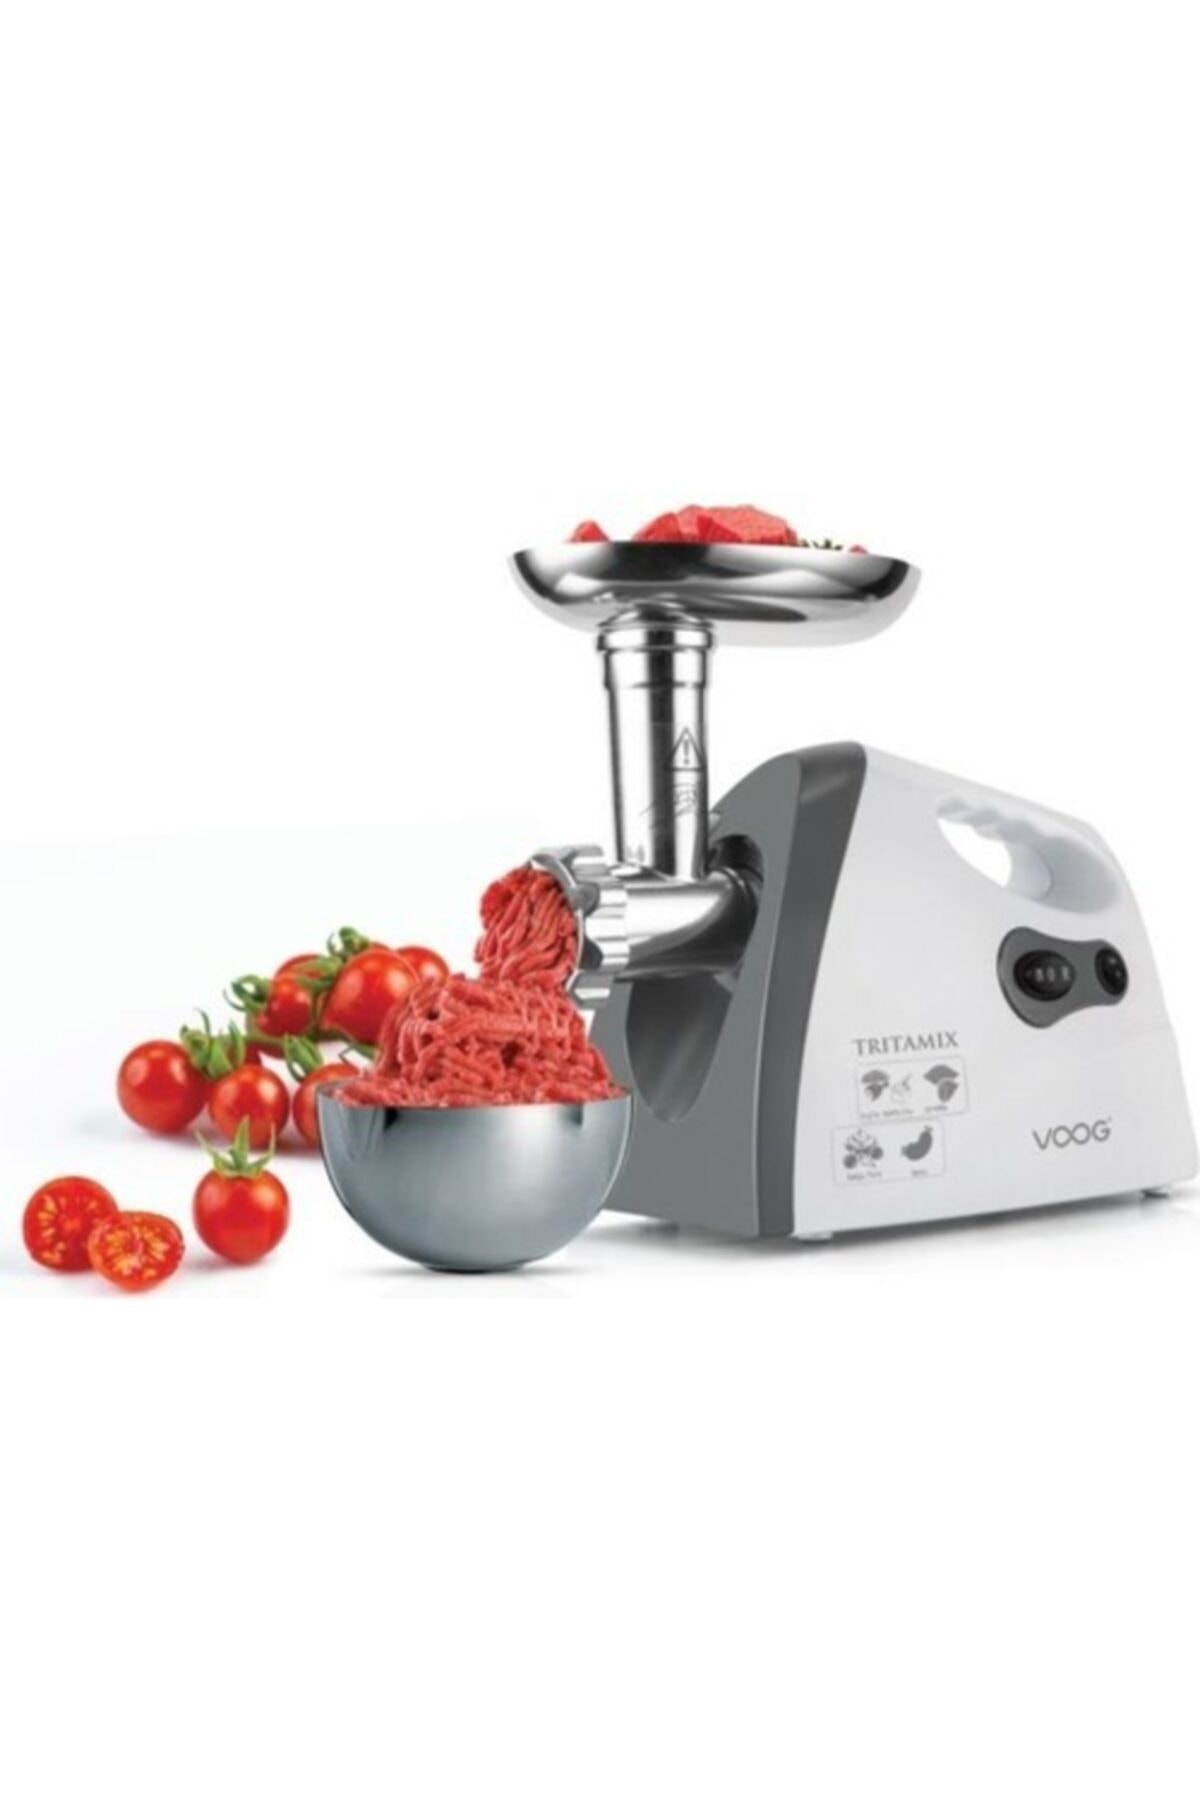 Gurme Elektrikli Kıyma Makinesi Et Sosis Sucuk Aleti 2200w